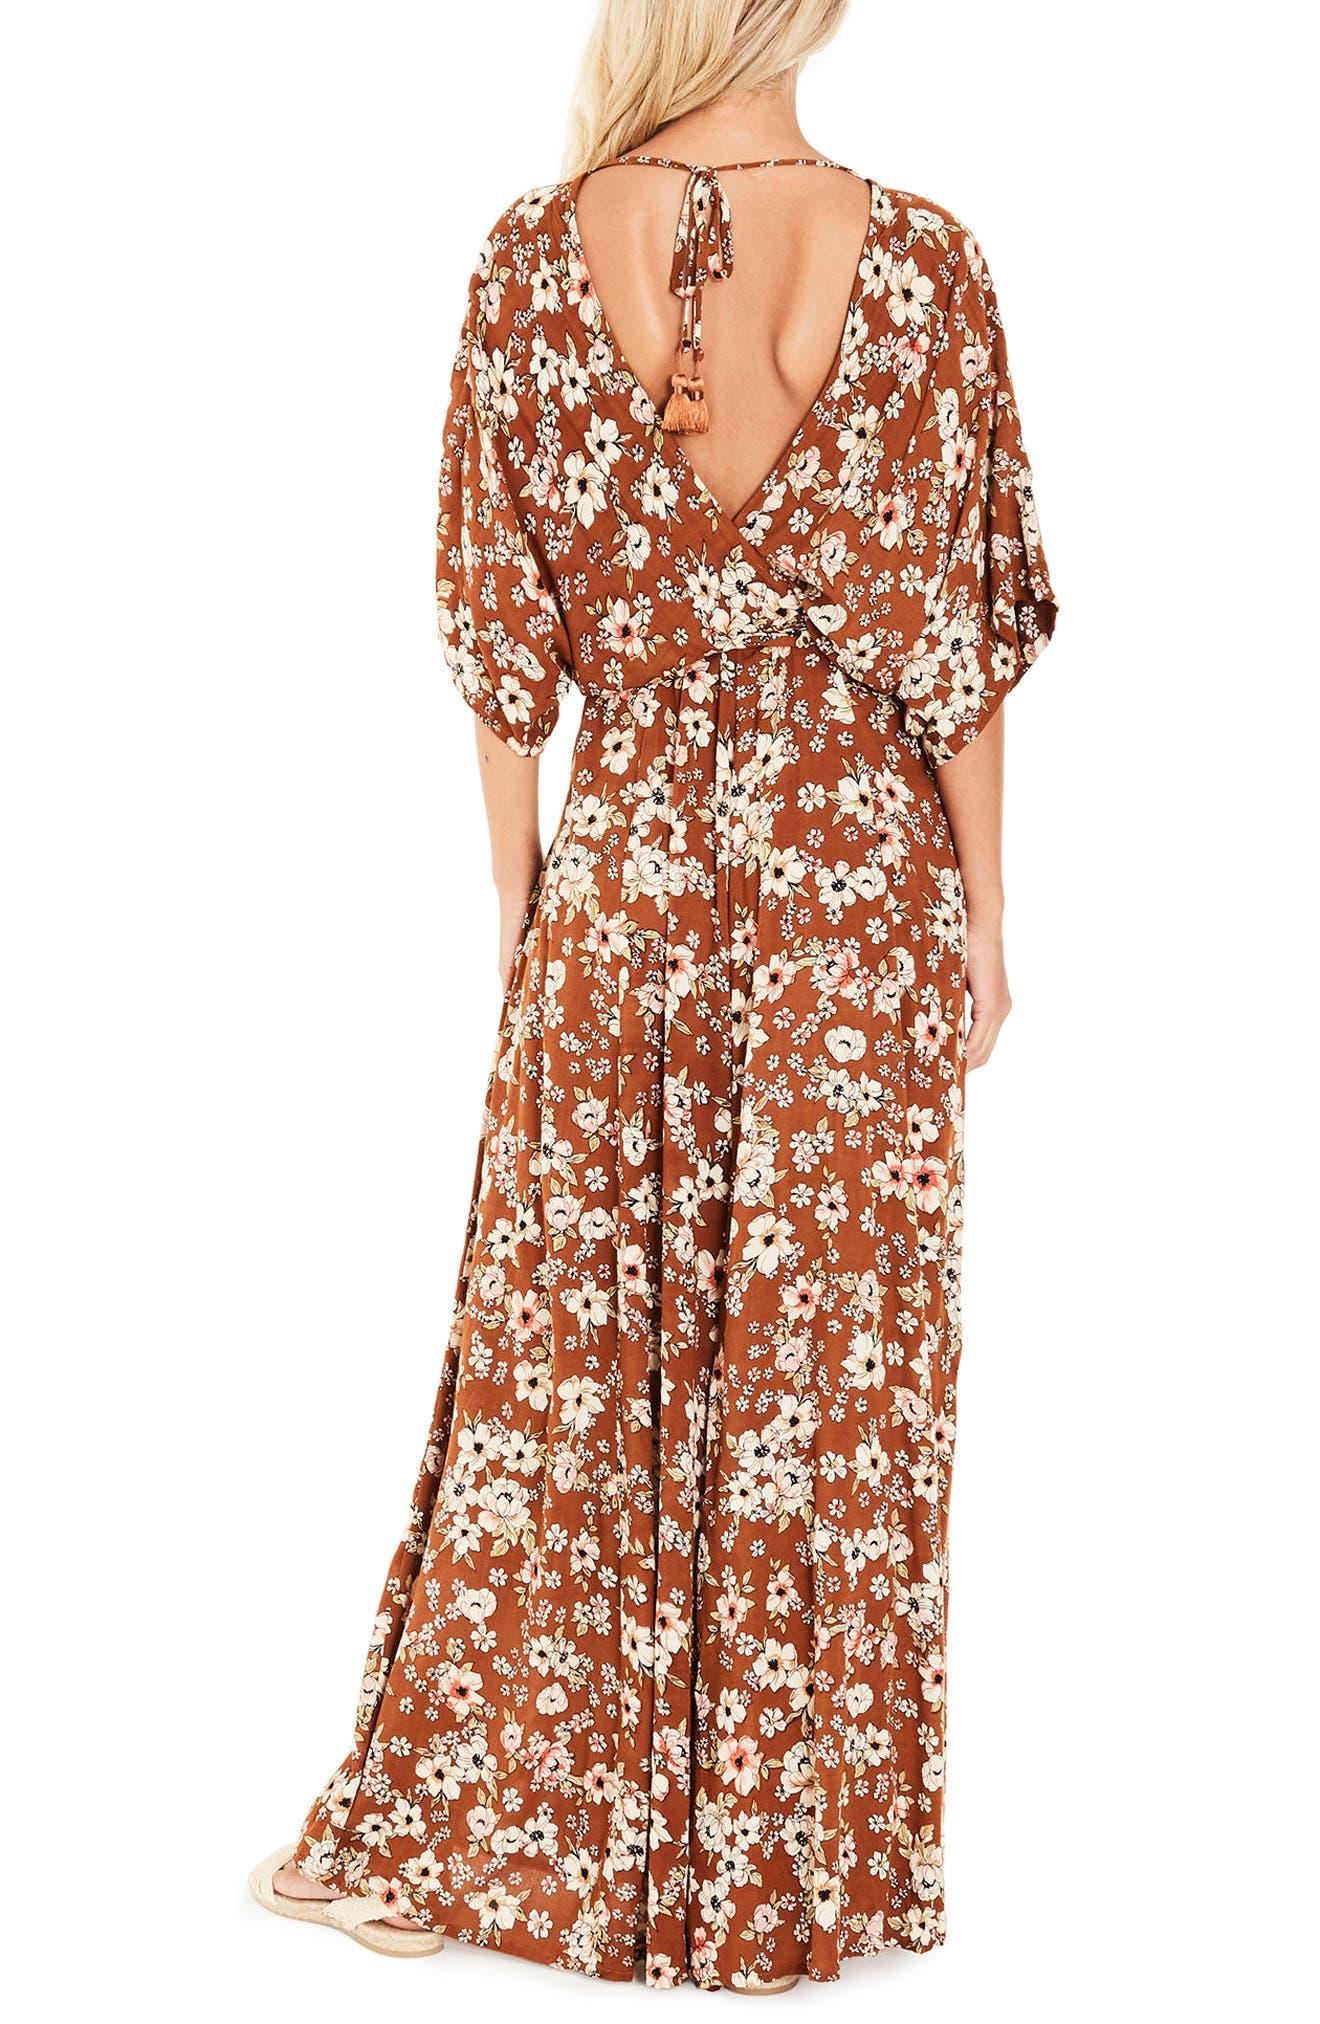 Bergamo Maxi Wrap Dress,                             Alternate thumbnail 2, color,                             Cecile Rose